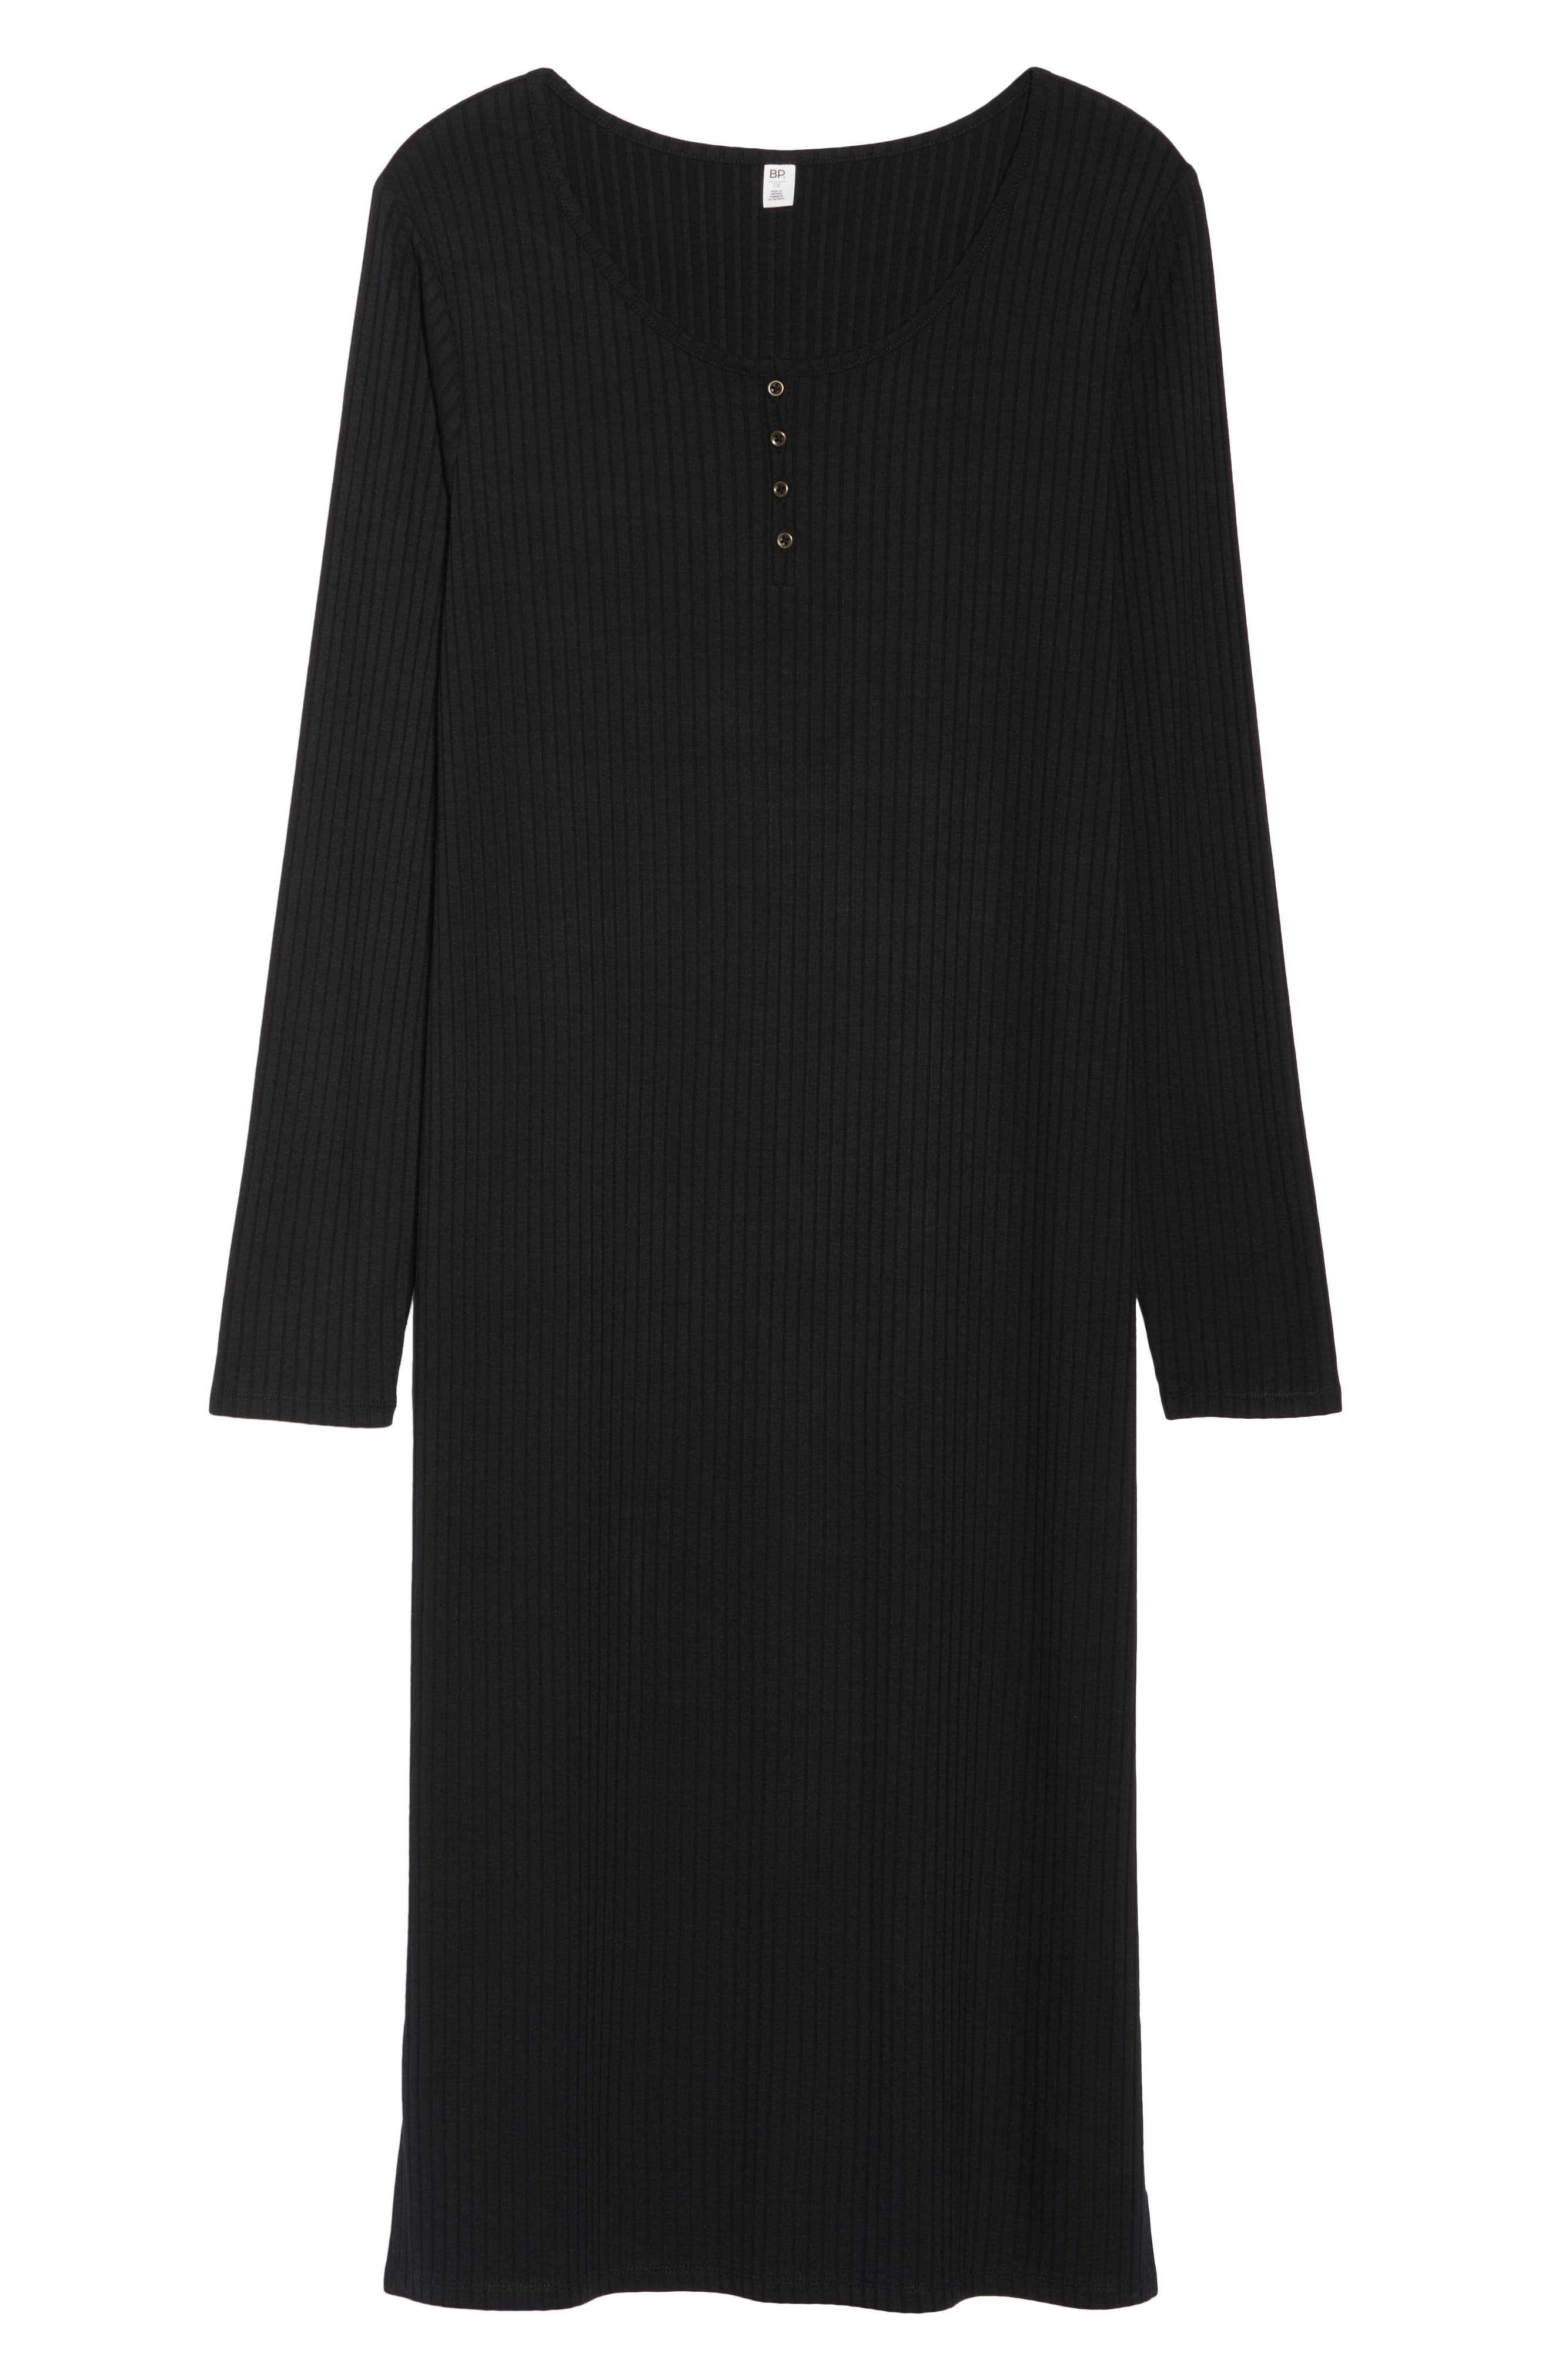 Ribbed Henley Midi Dress,                             Alternate thumbnail 12, color,                             BLACK